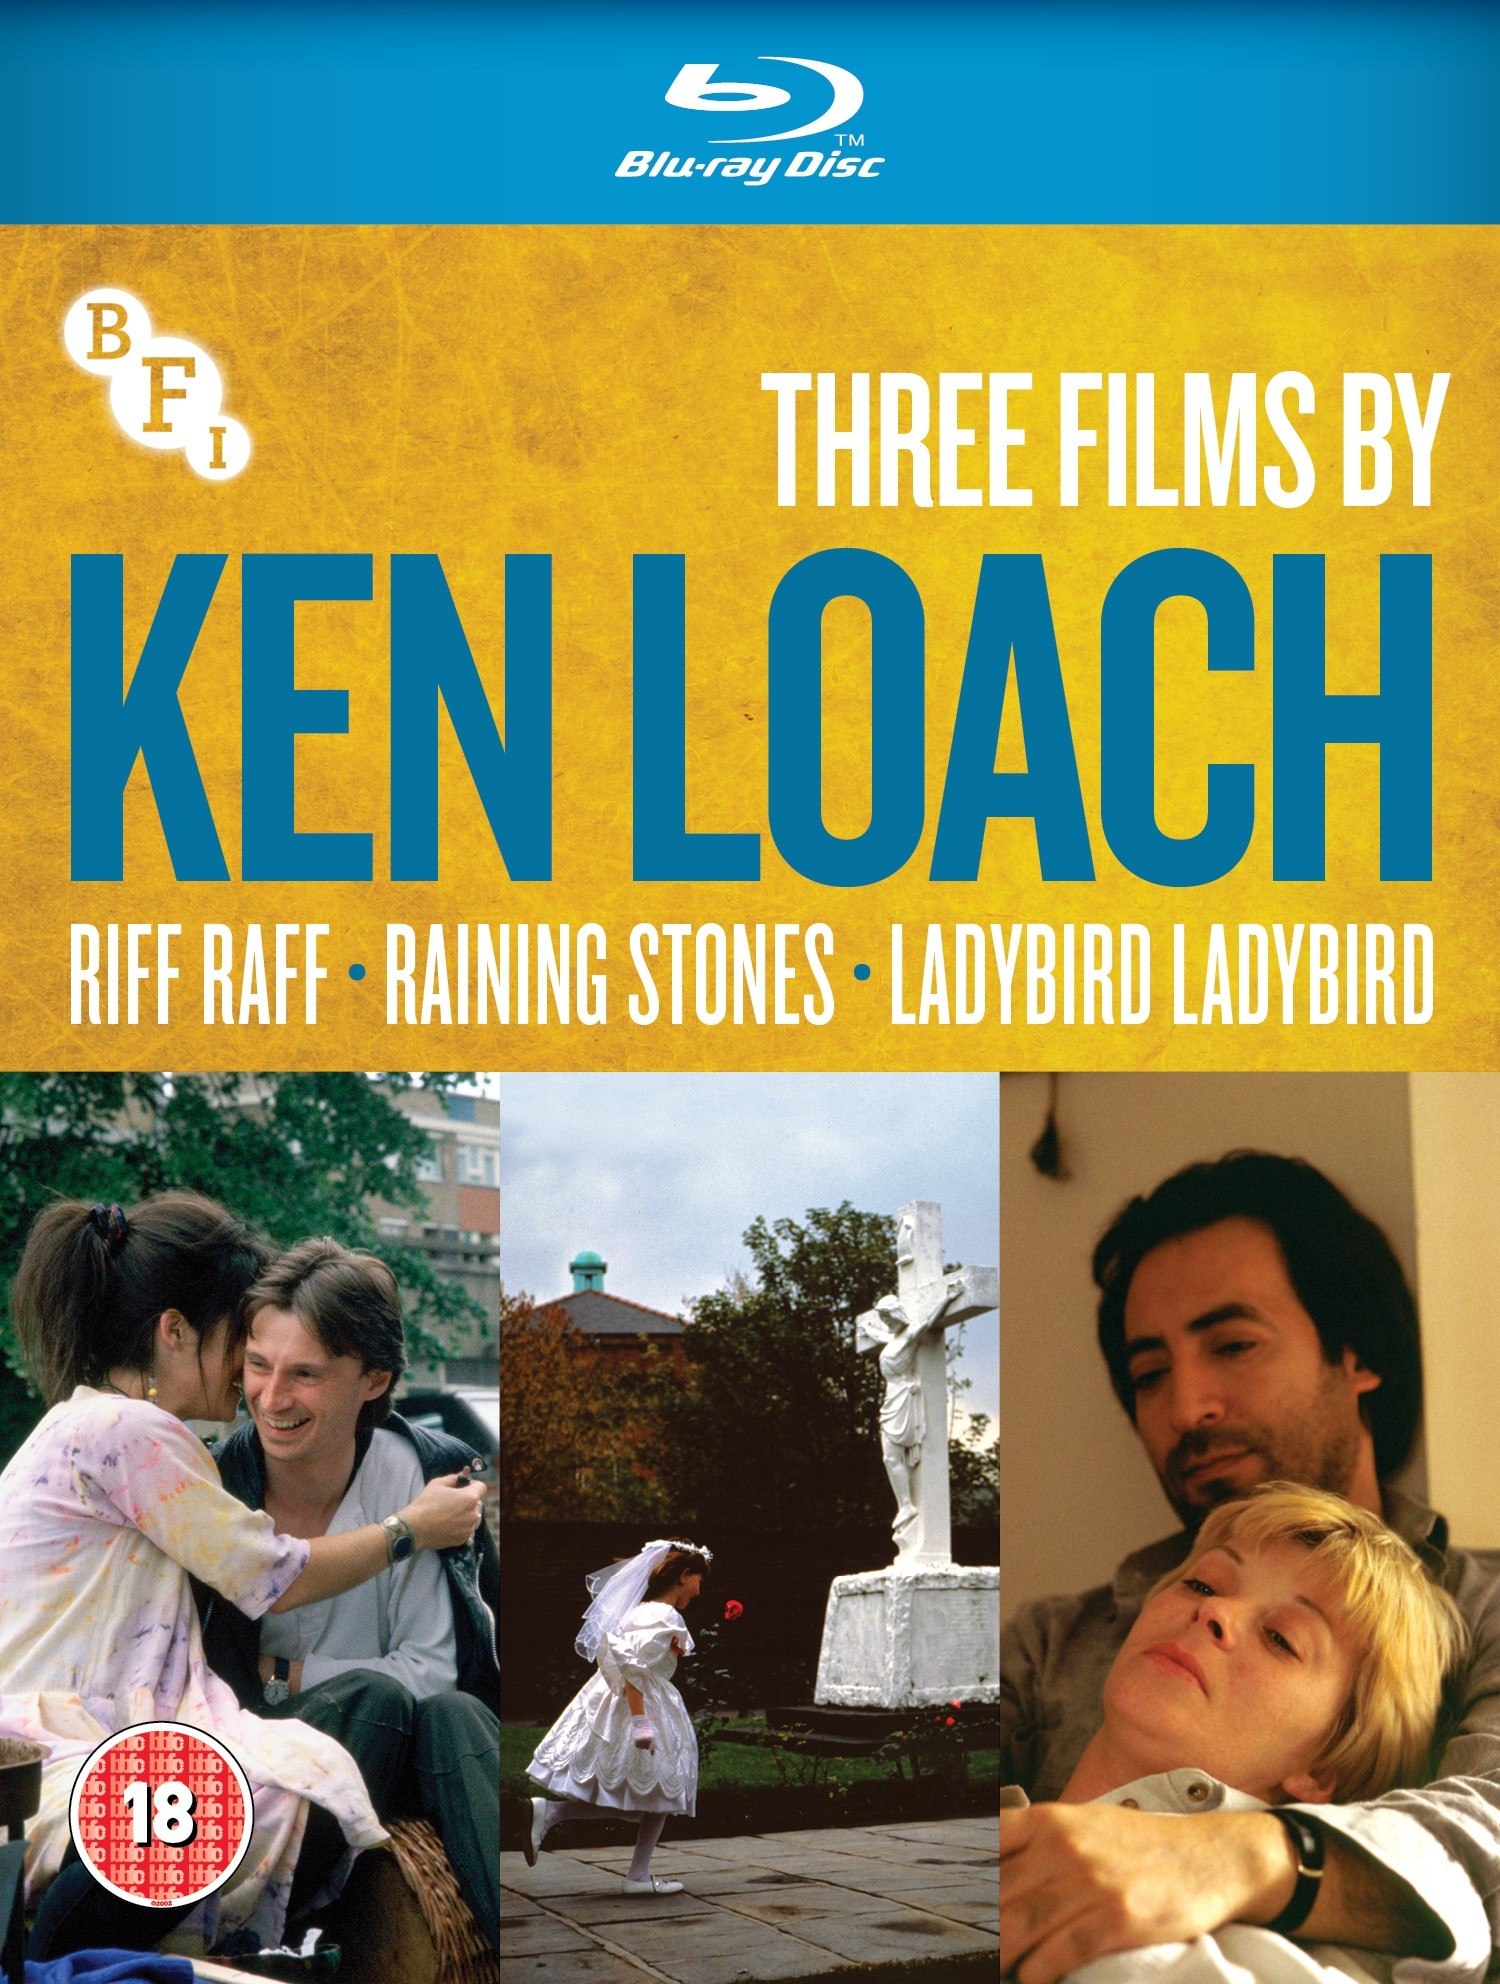 Buy Three films by Ken Loach: Riff Raff, Raining Stones, Ladybird Ladybird (BLU-RAY)